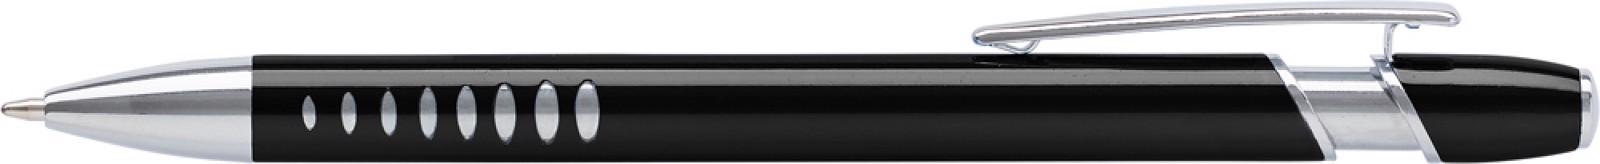 Aluminium ballpen with UV coating - Black